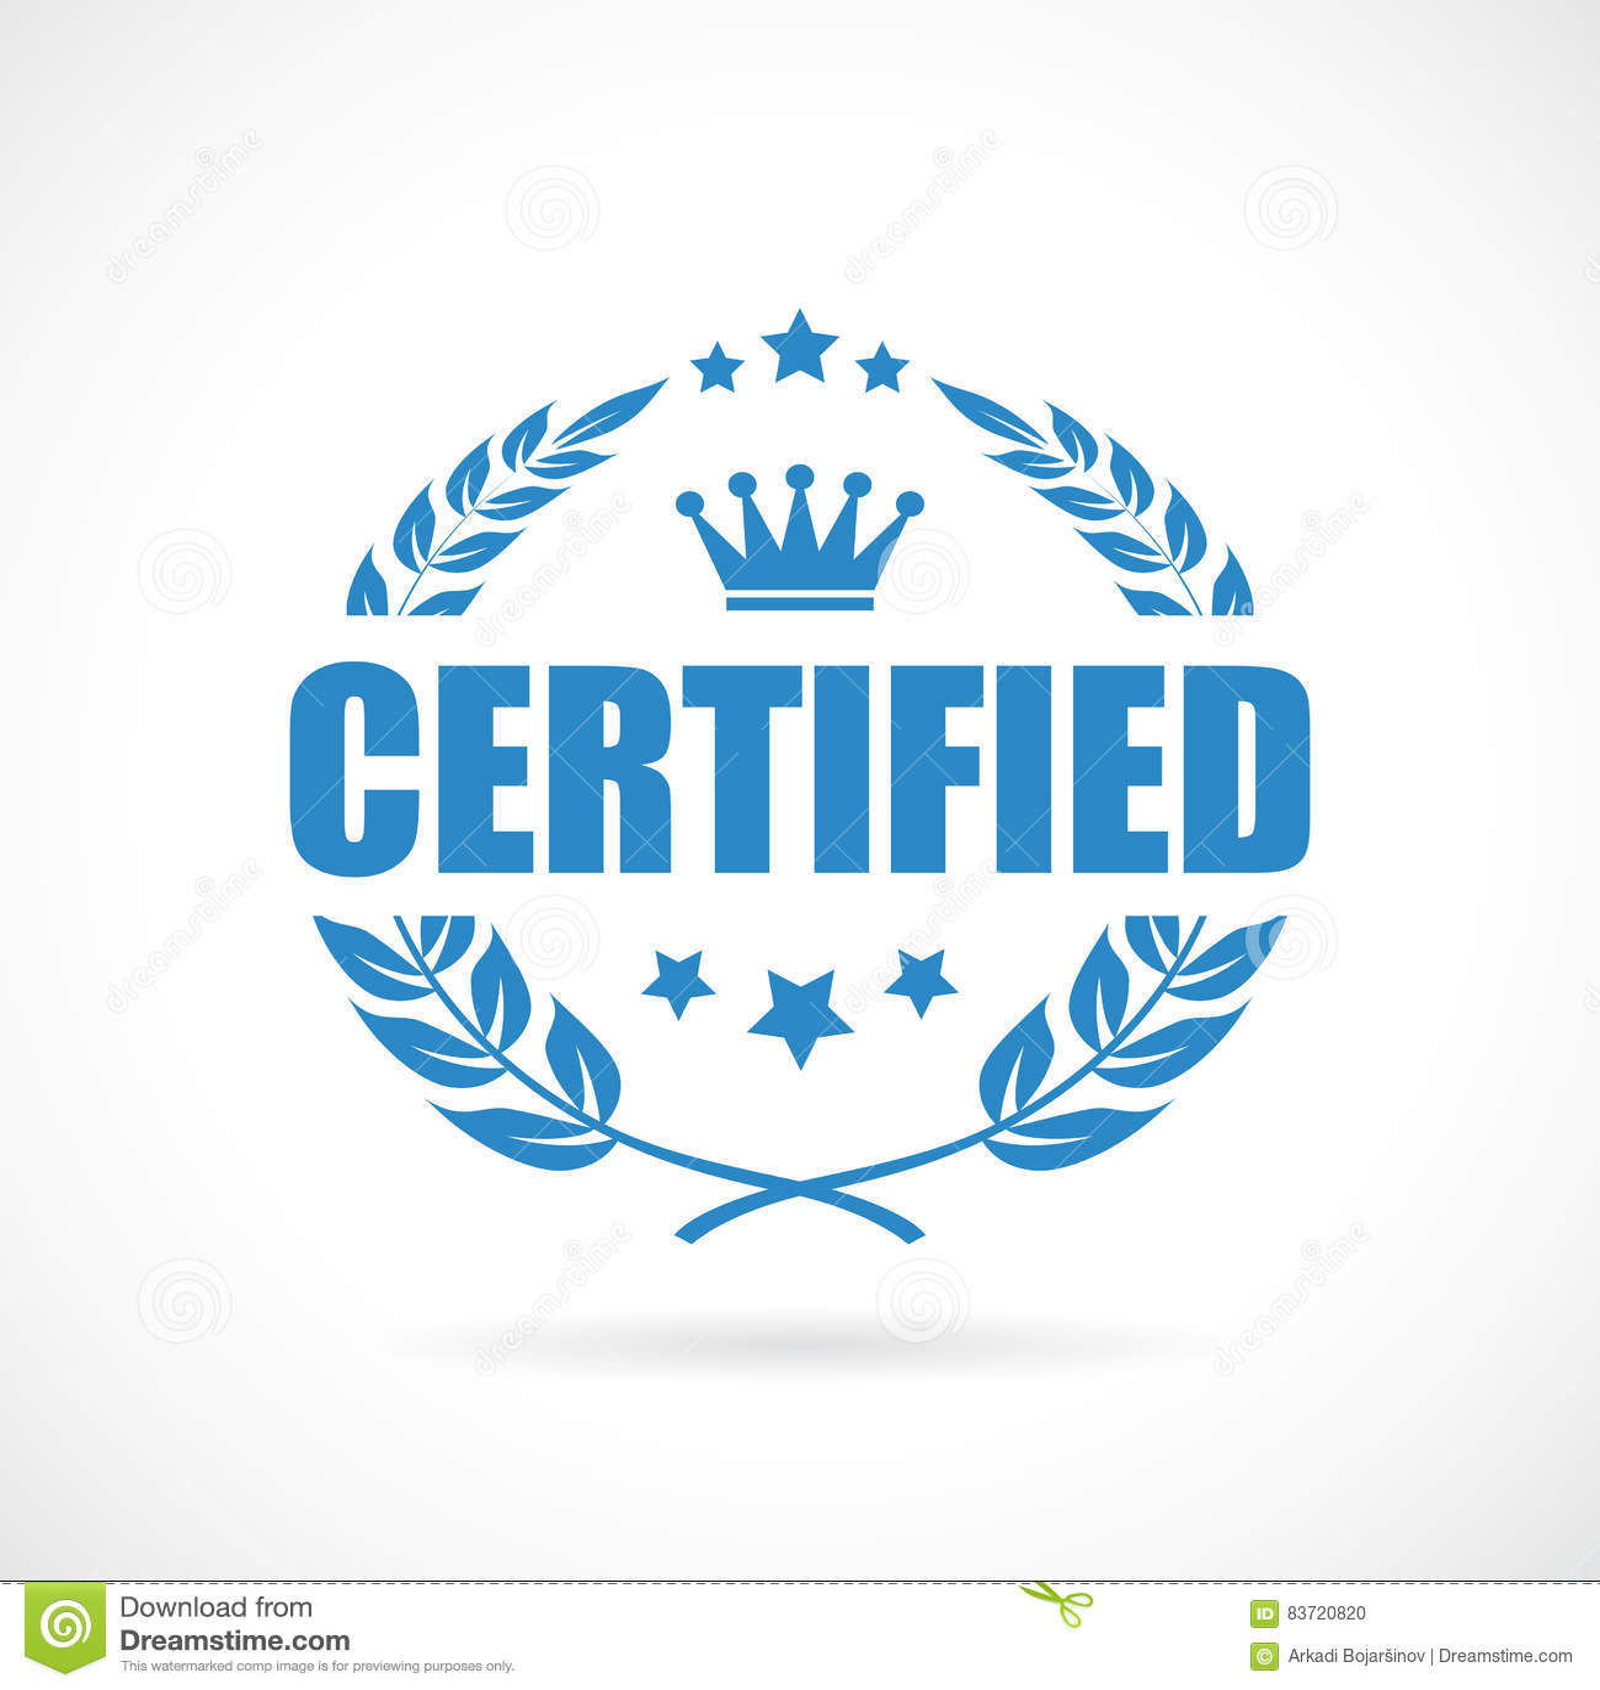 Certified Vector Icon Stock Vector